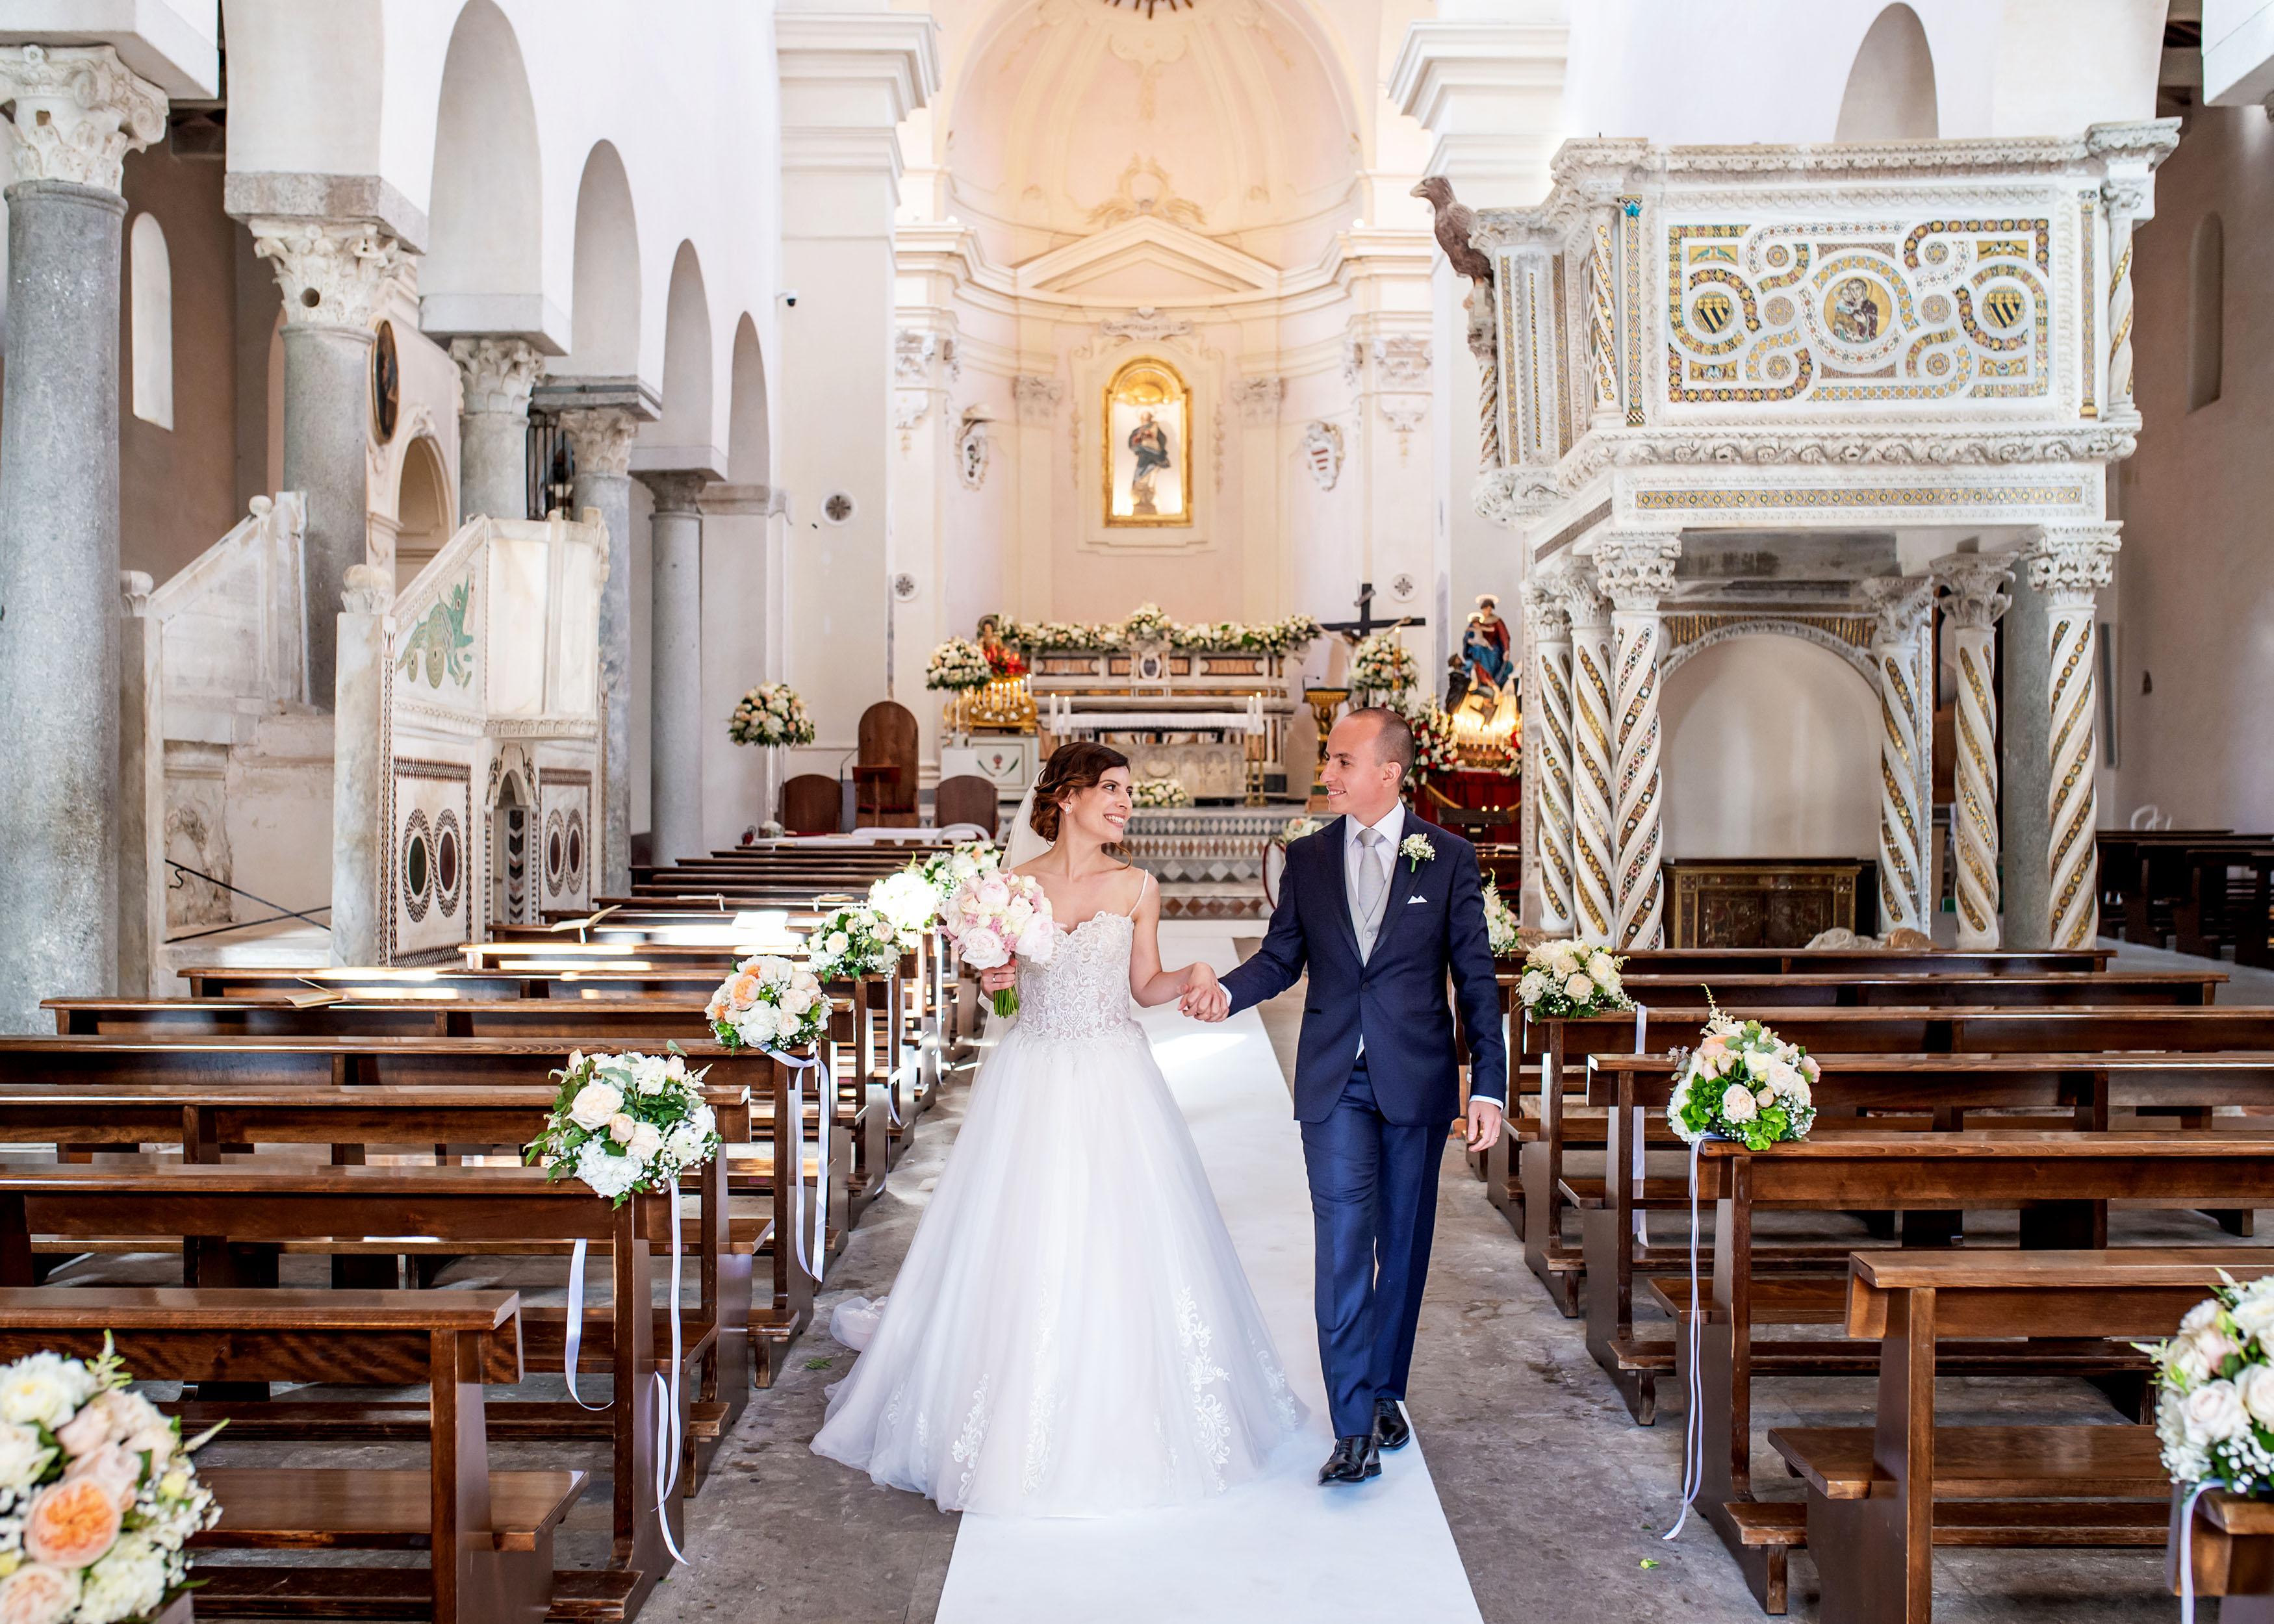 https://www.weddingamalfi.com/wp-content/uploads/Katia-Jorge-18-maggio-2019-28.jpg